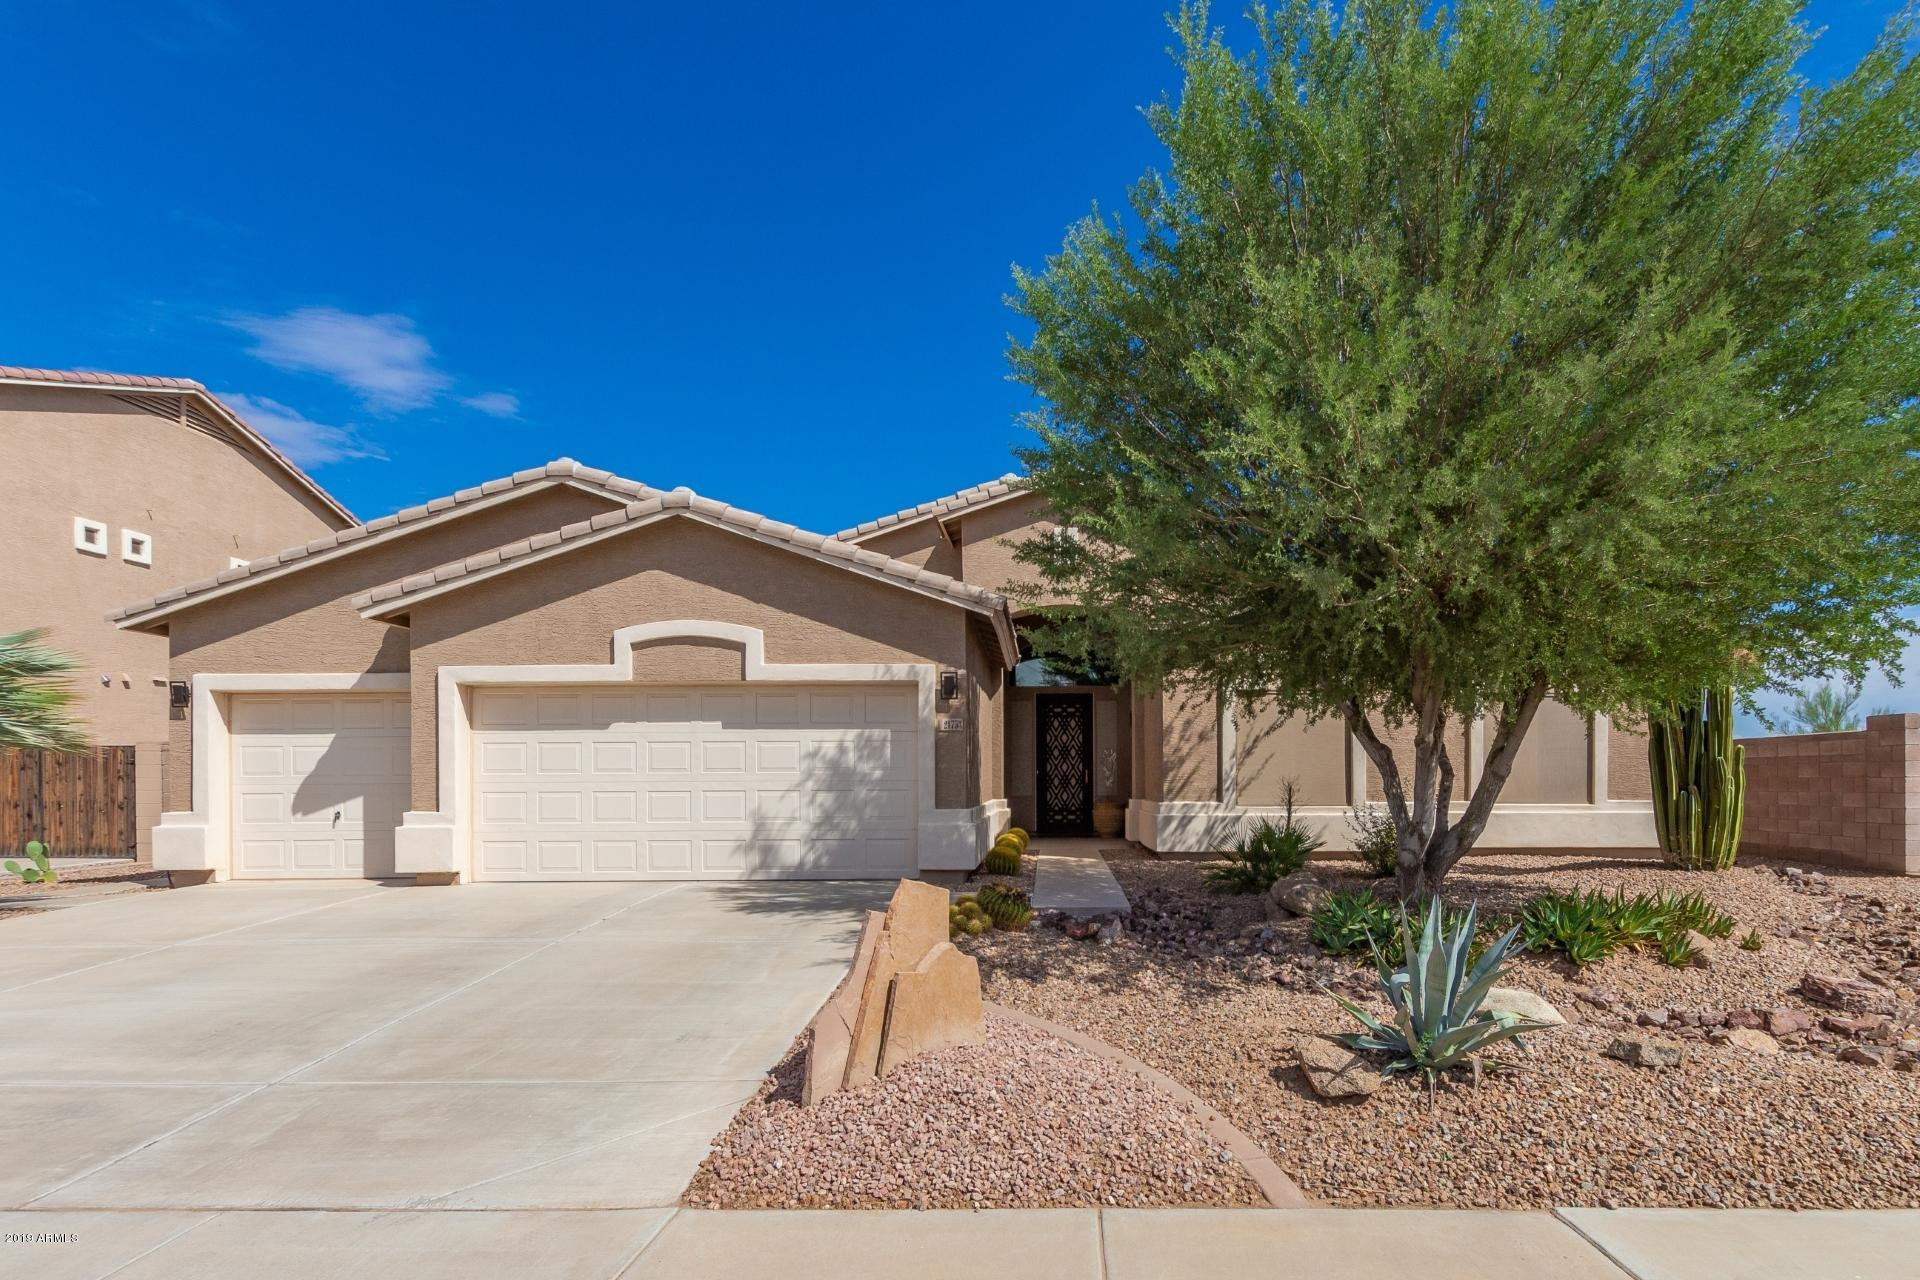 Photo of 21753 N GREENWAY Drive, Maricopa, AZ 85138